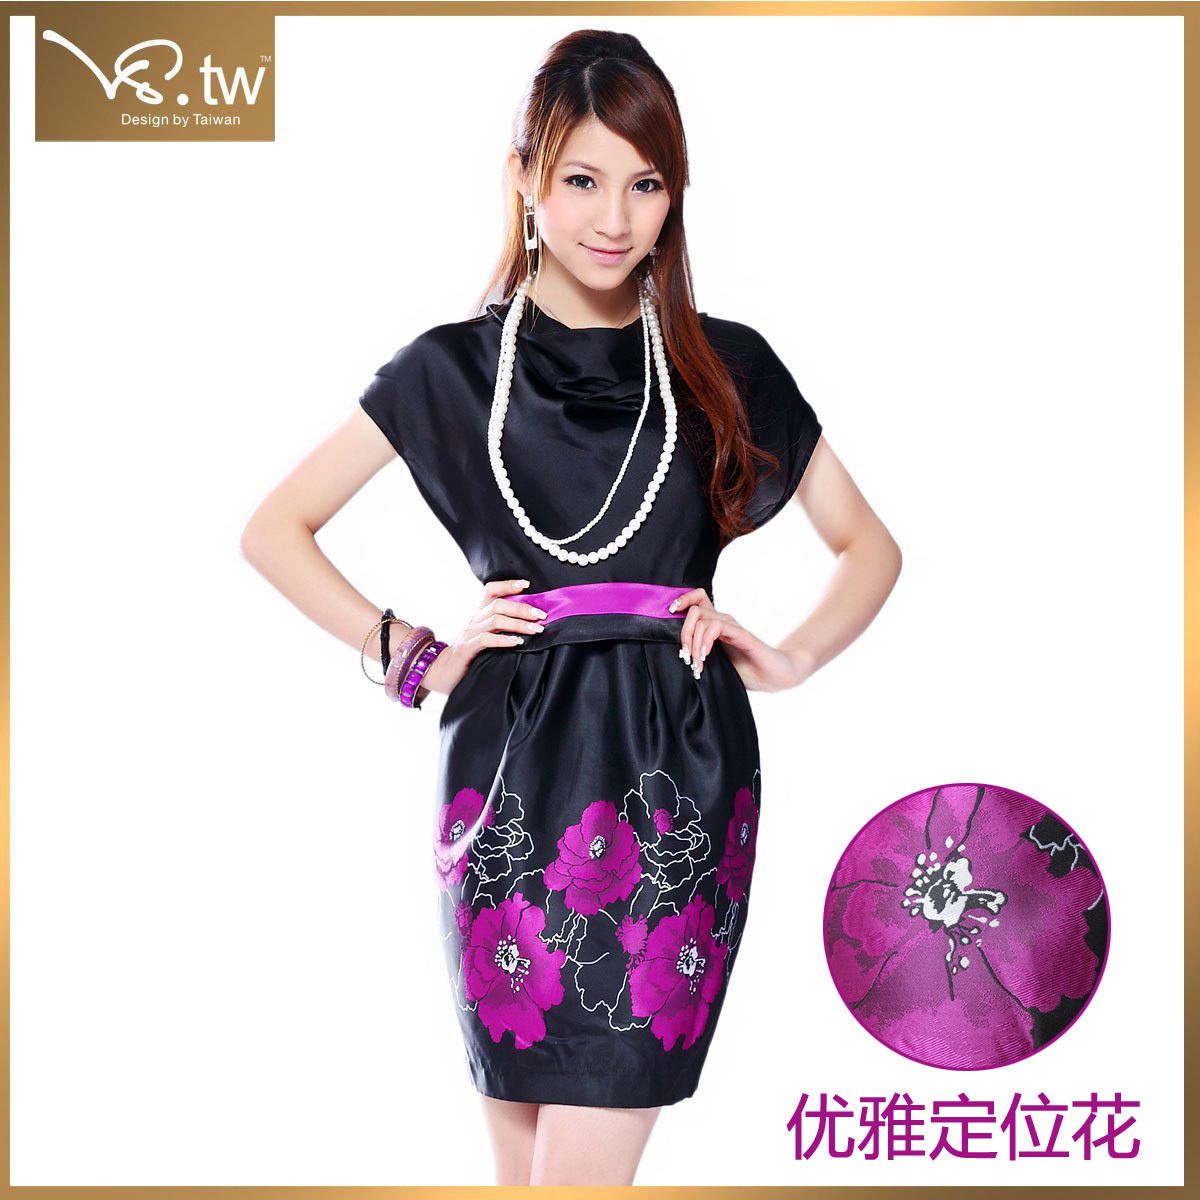 Женское платье VS.TW s1835 2011 OL Шифон